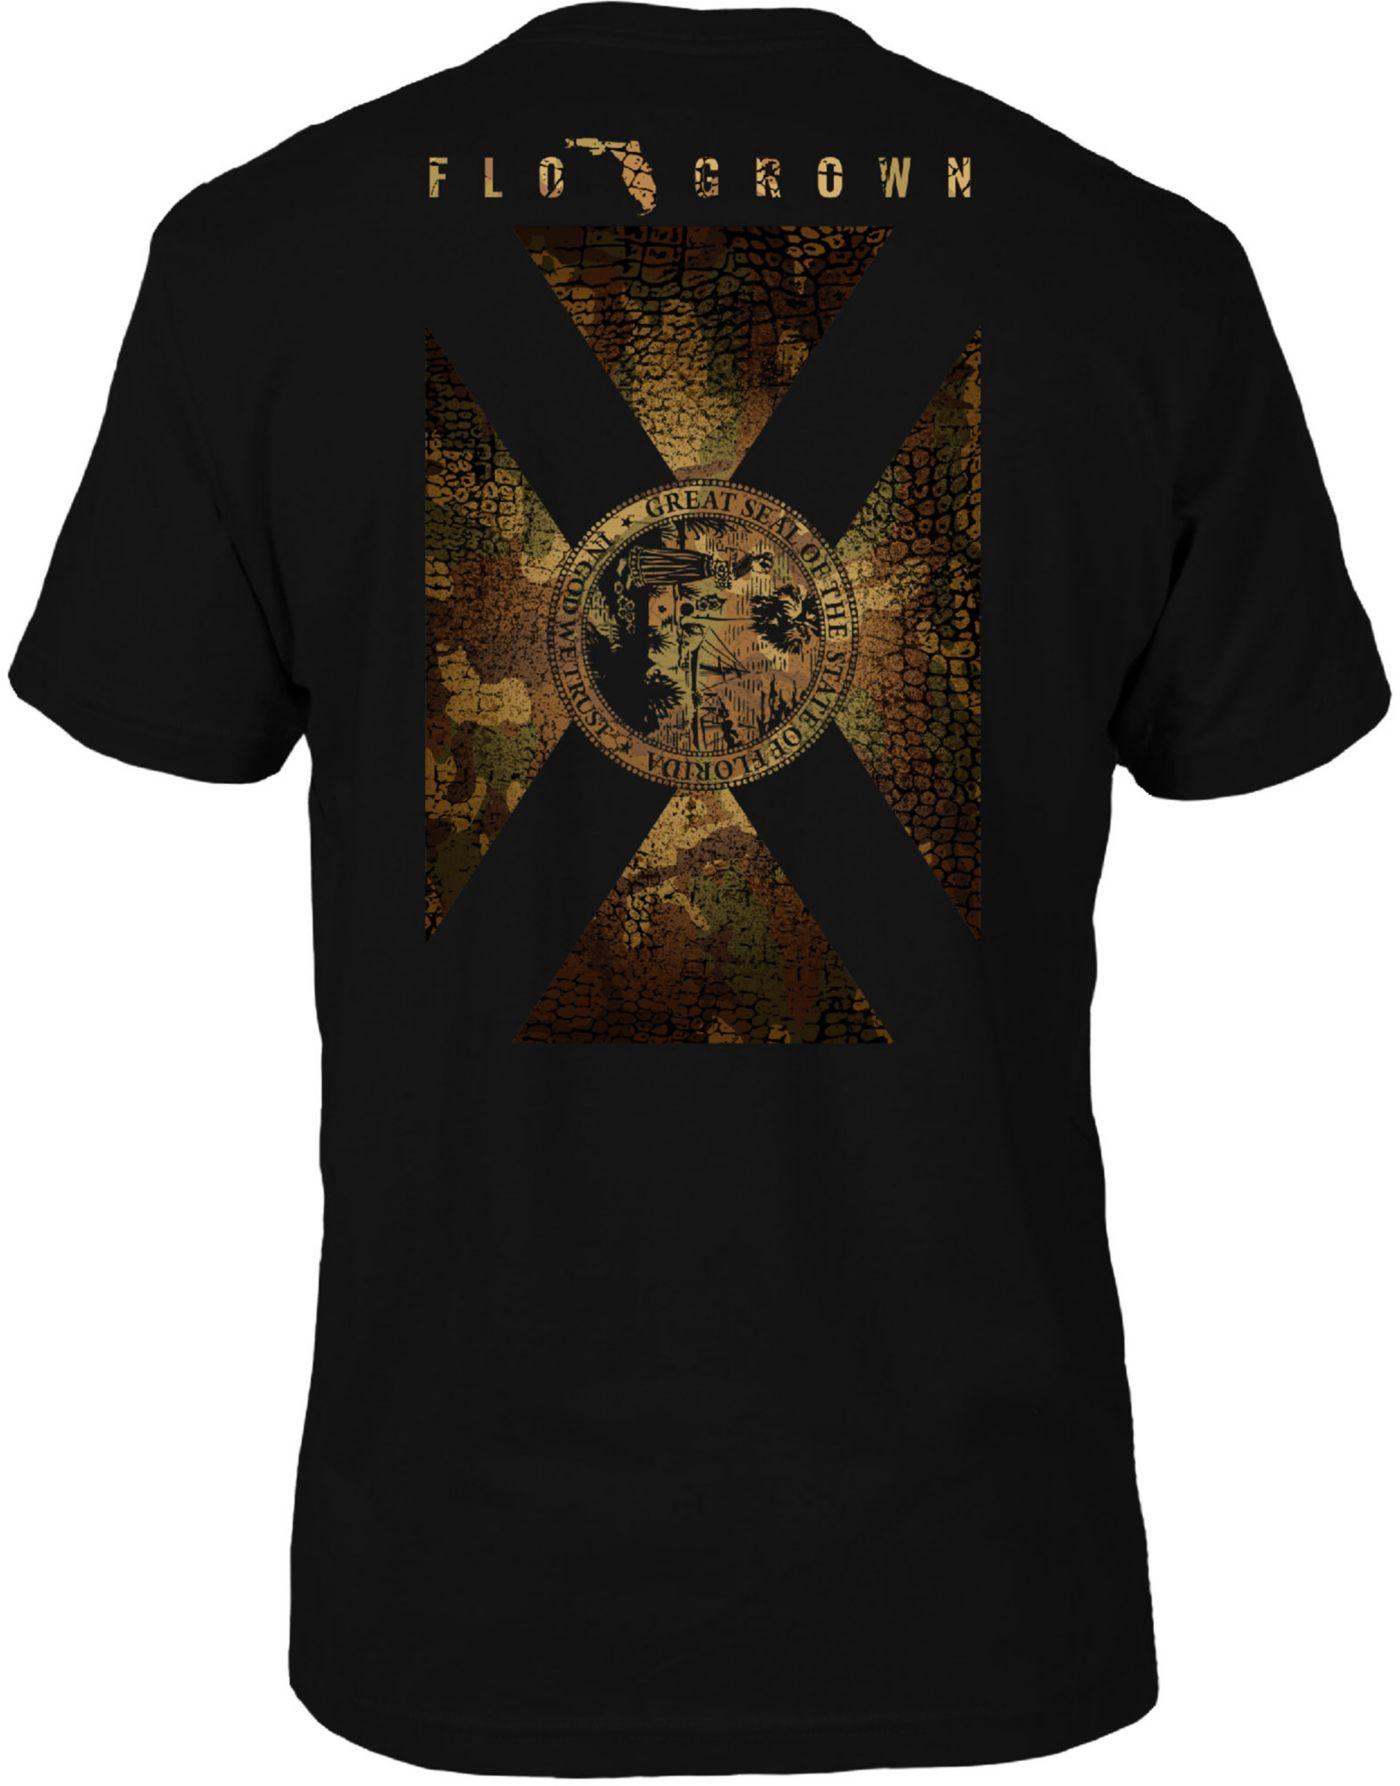 FloGrown Men's Gator Camo Flag Short Sleeve T-Shirt